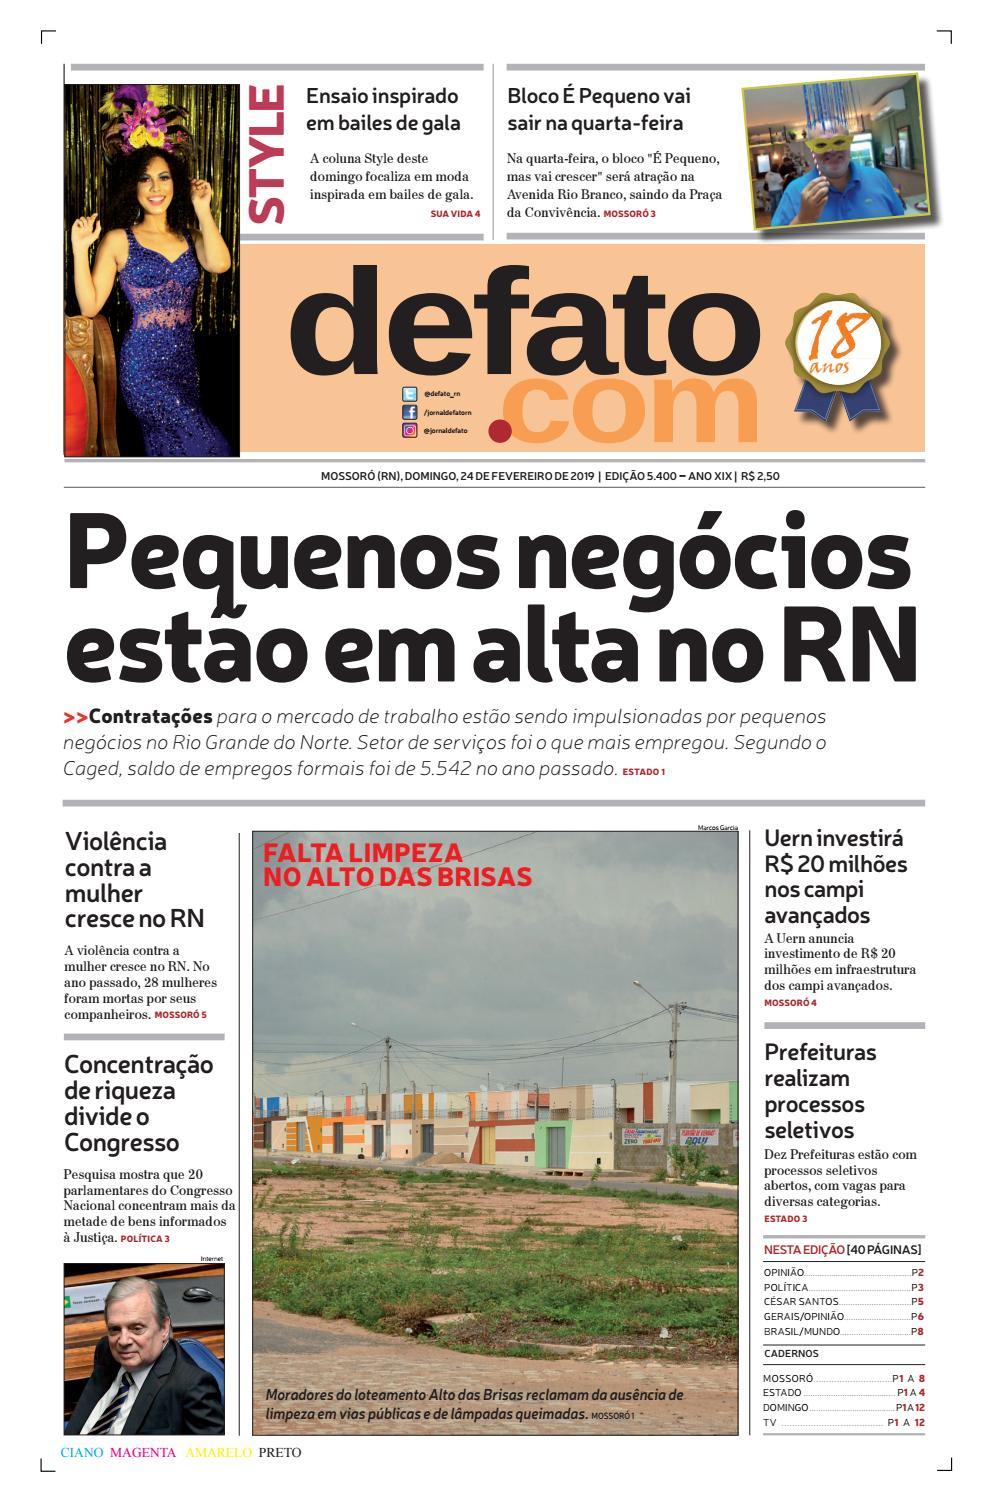 6a38f3e06 Jornal de Fato by Jornal de Fato - issuu